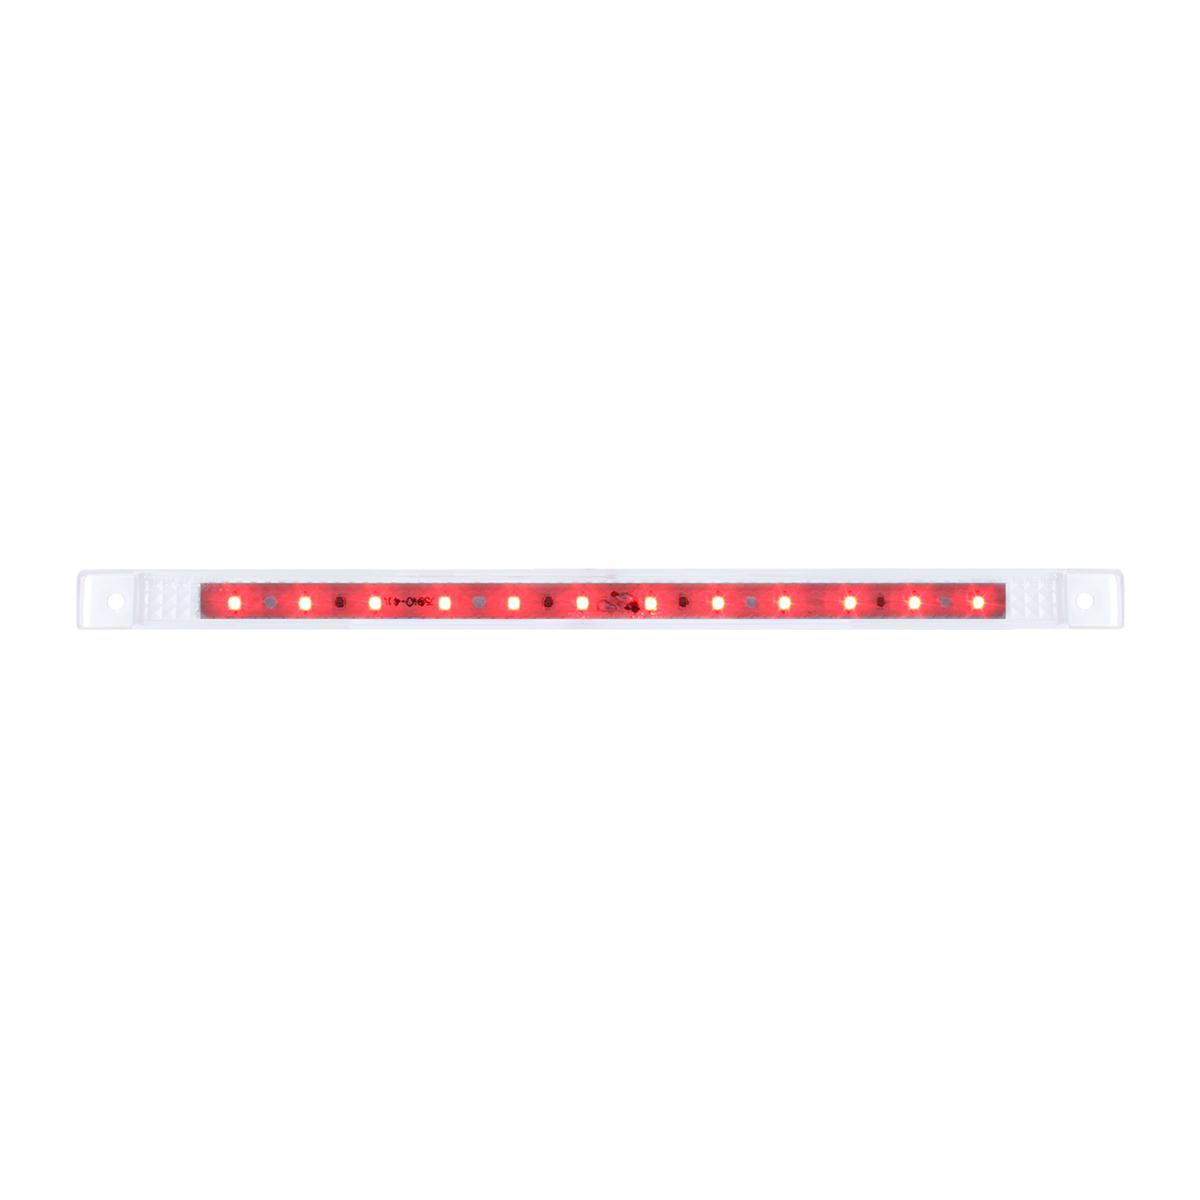 "75965 10-1/8"" Ultra Thin LED Marker Light"